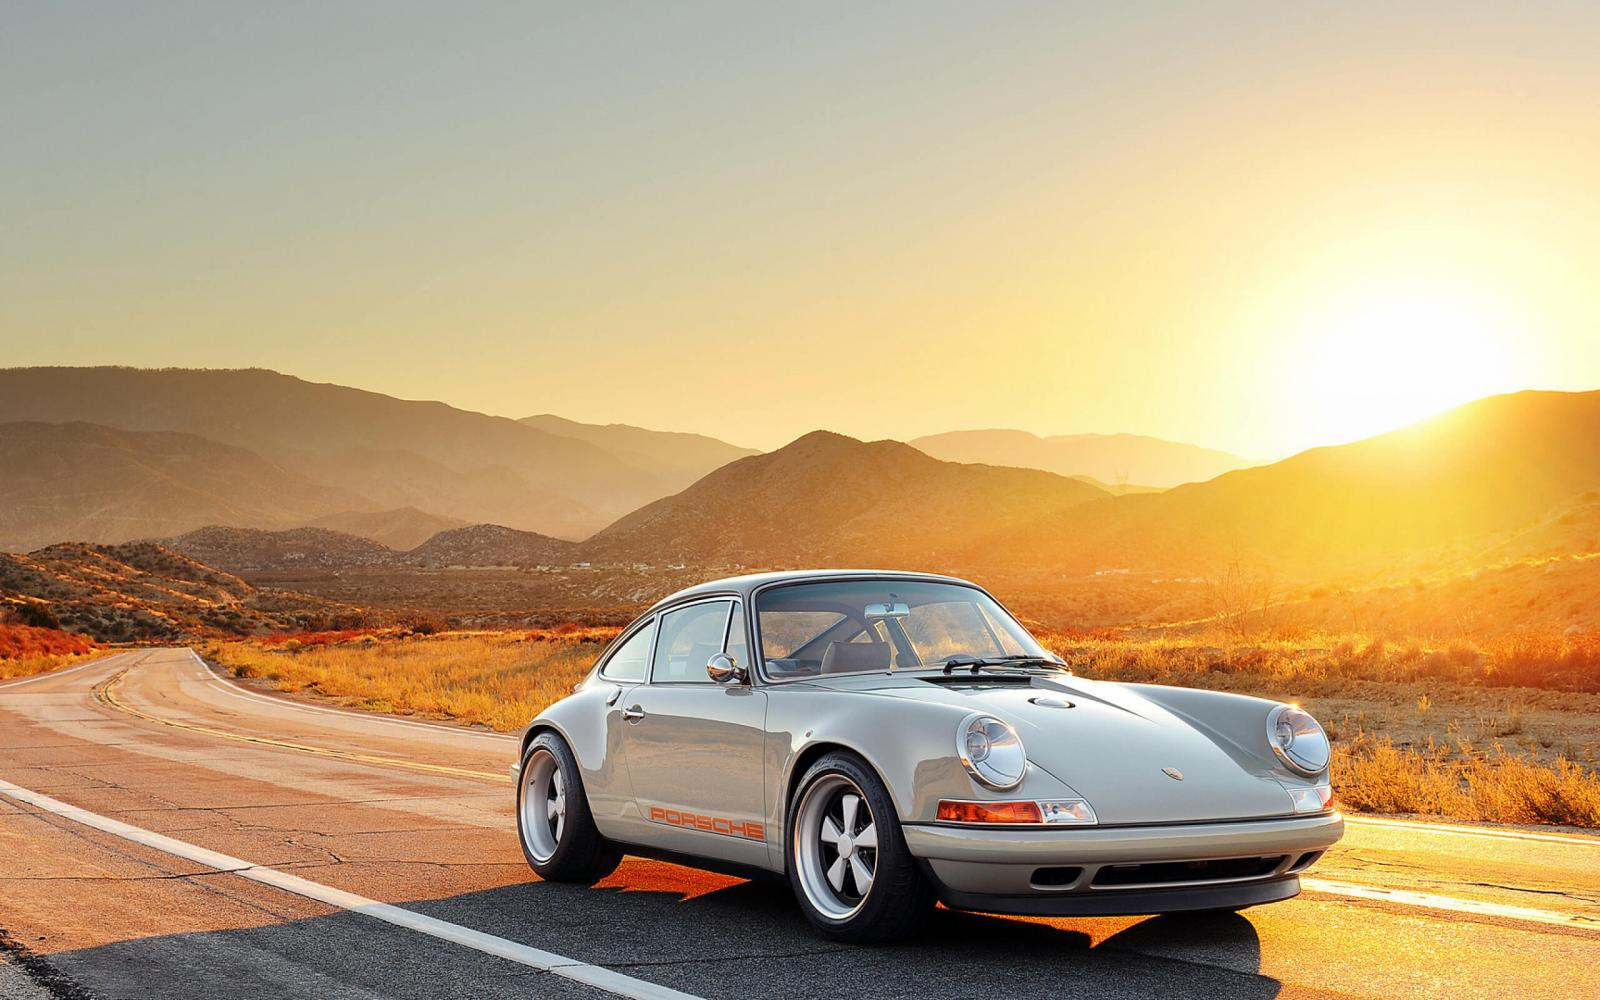 Coche Porsche en la carretera